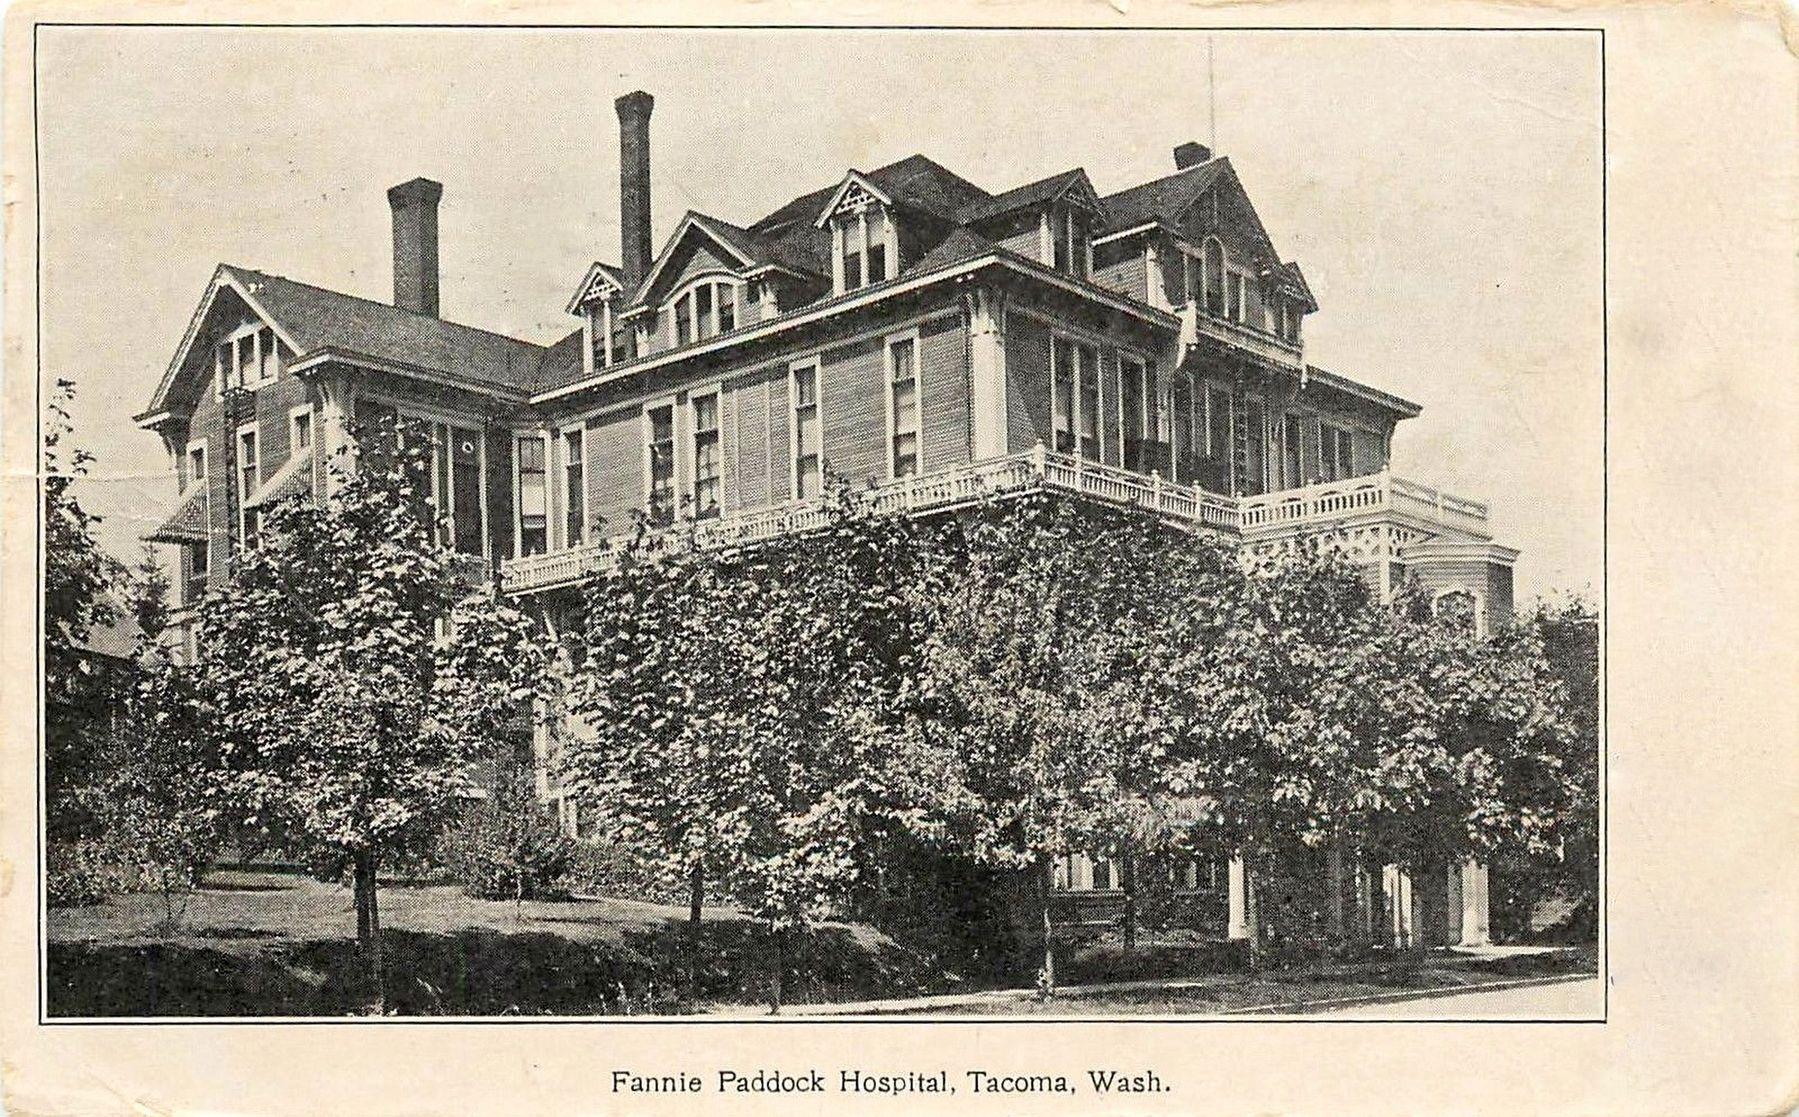 Fannie Paddock Hospital, Tacoma, Washington.